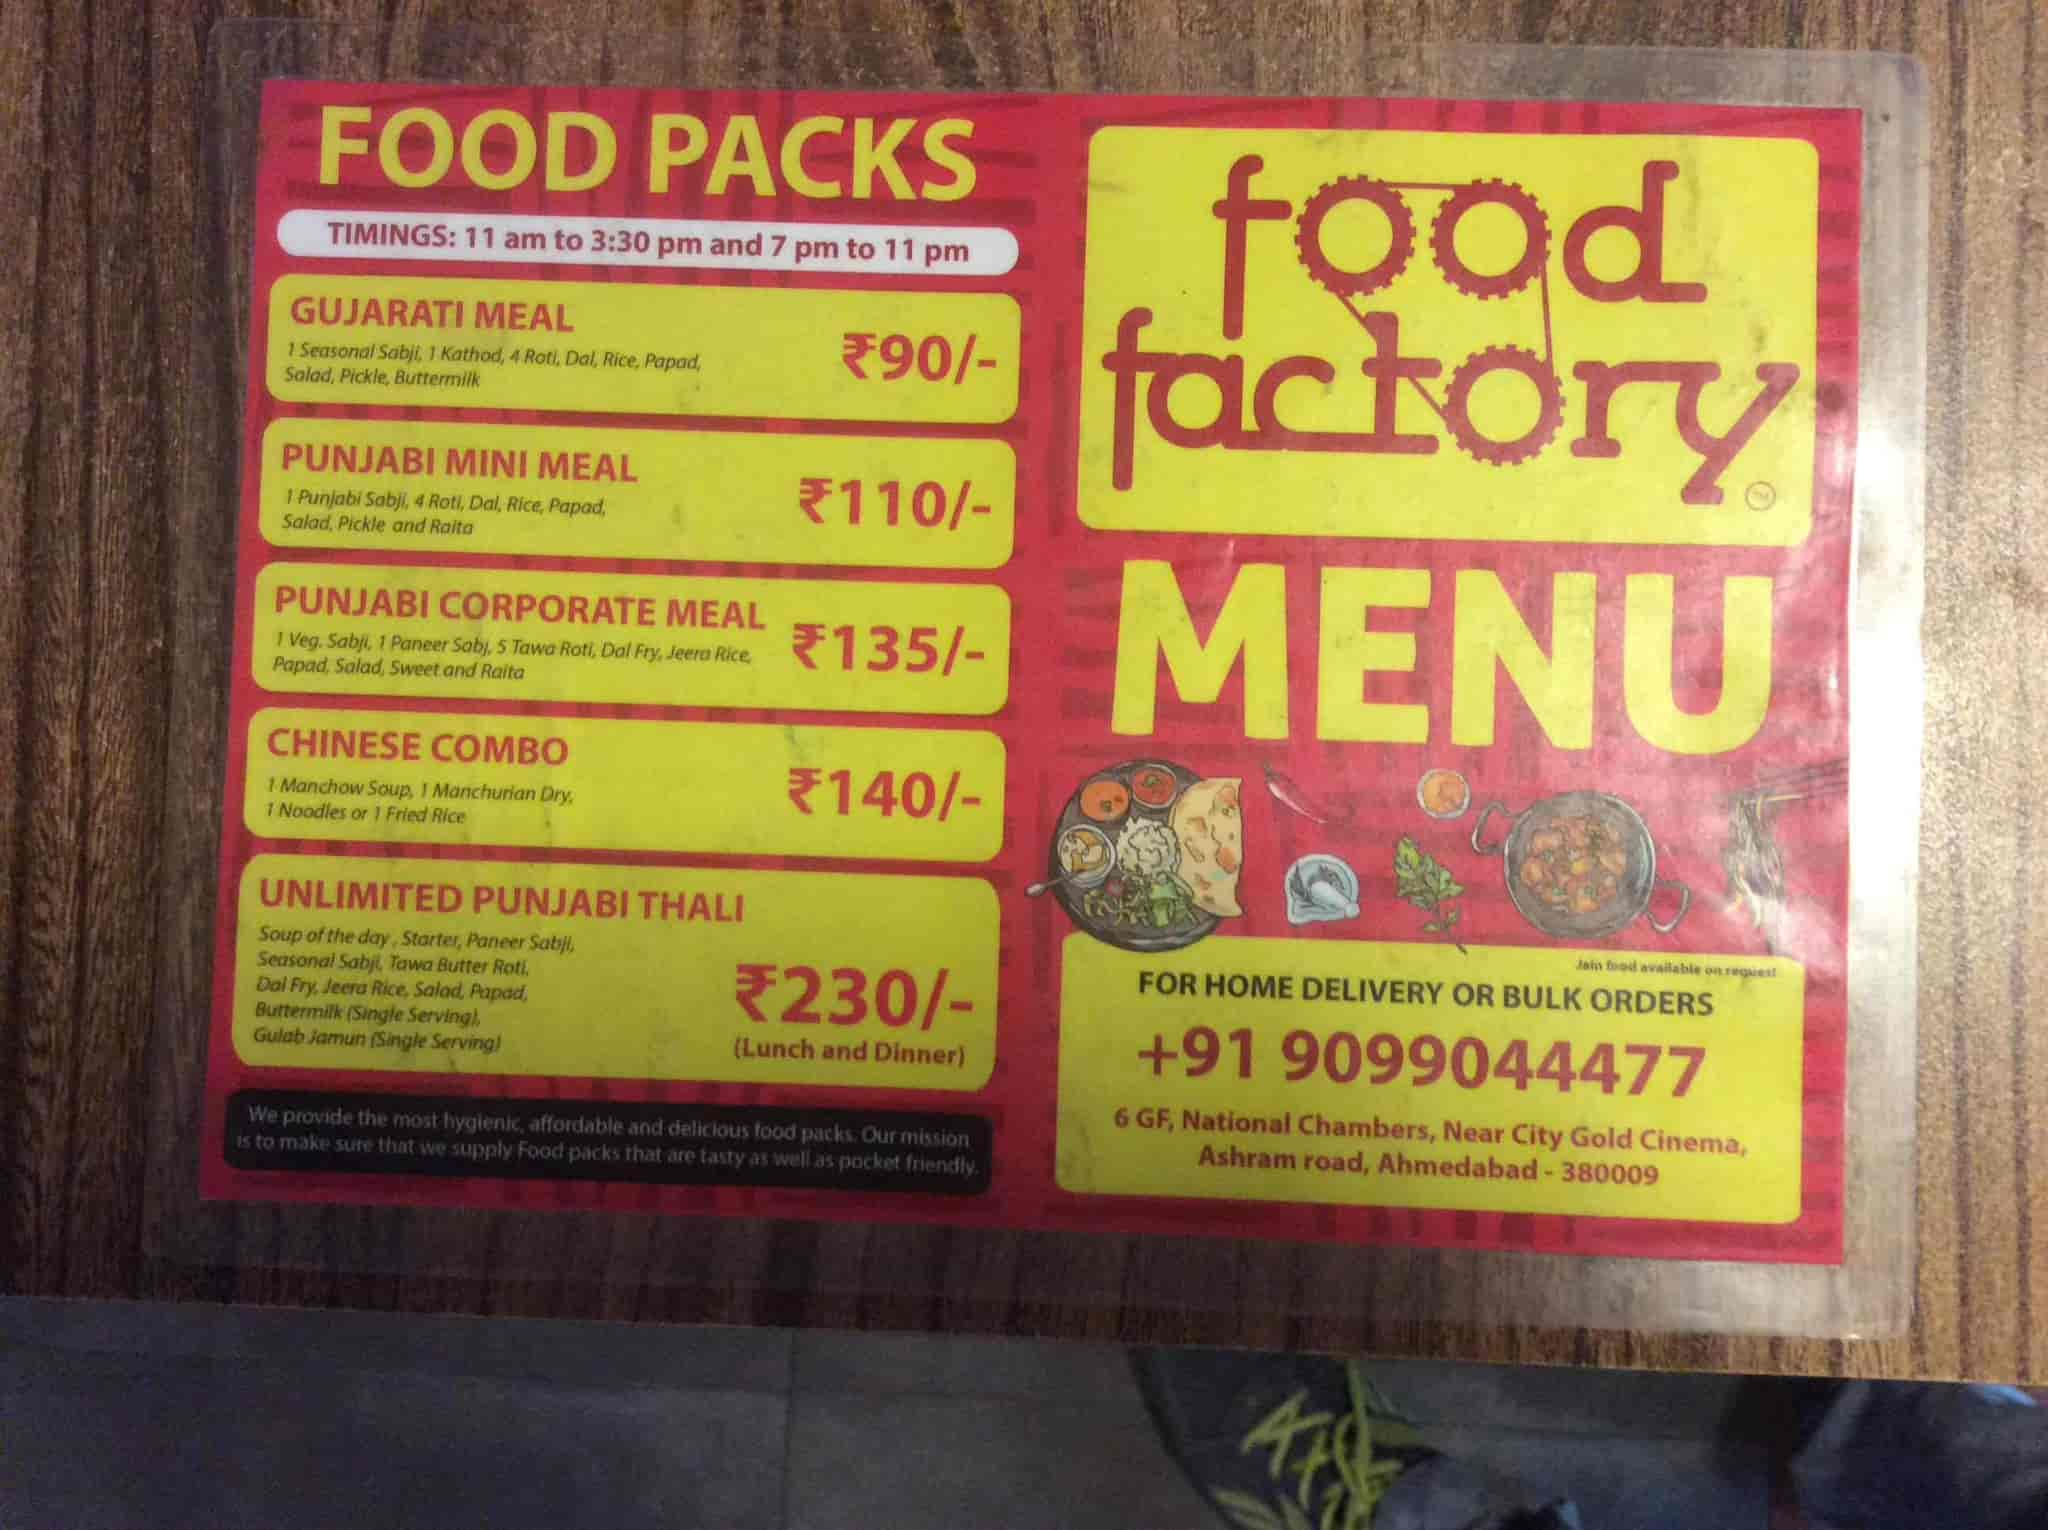 Food Factory, Ashram Road, Ahmedabad - North Indian Cuisine